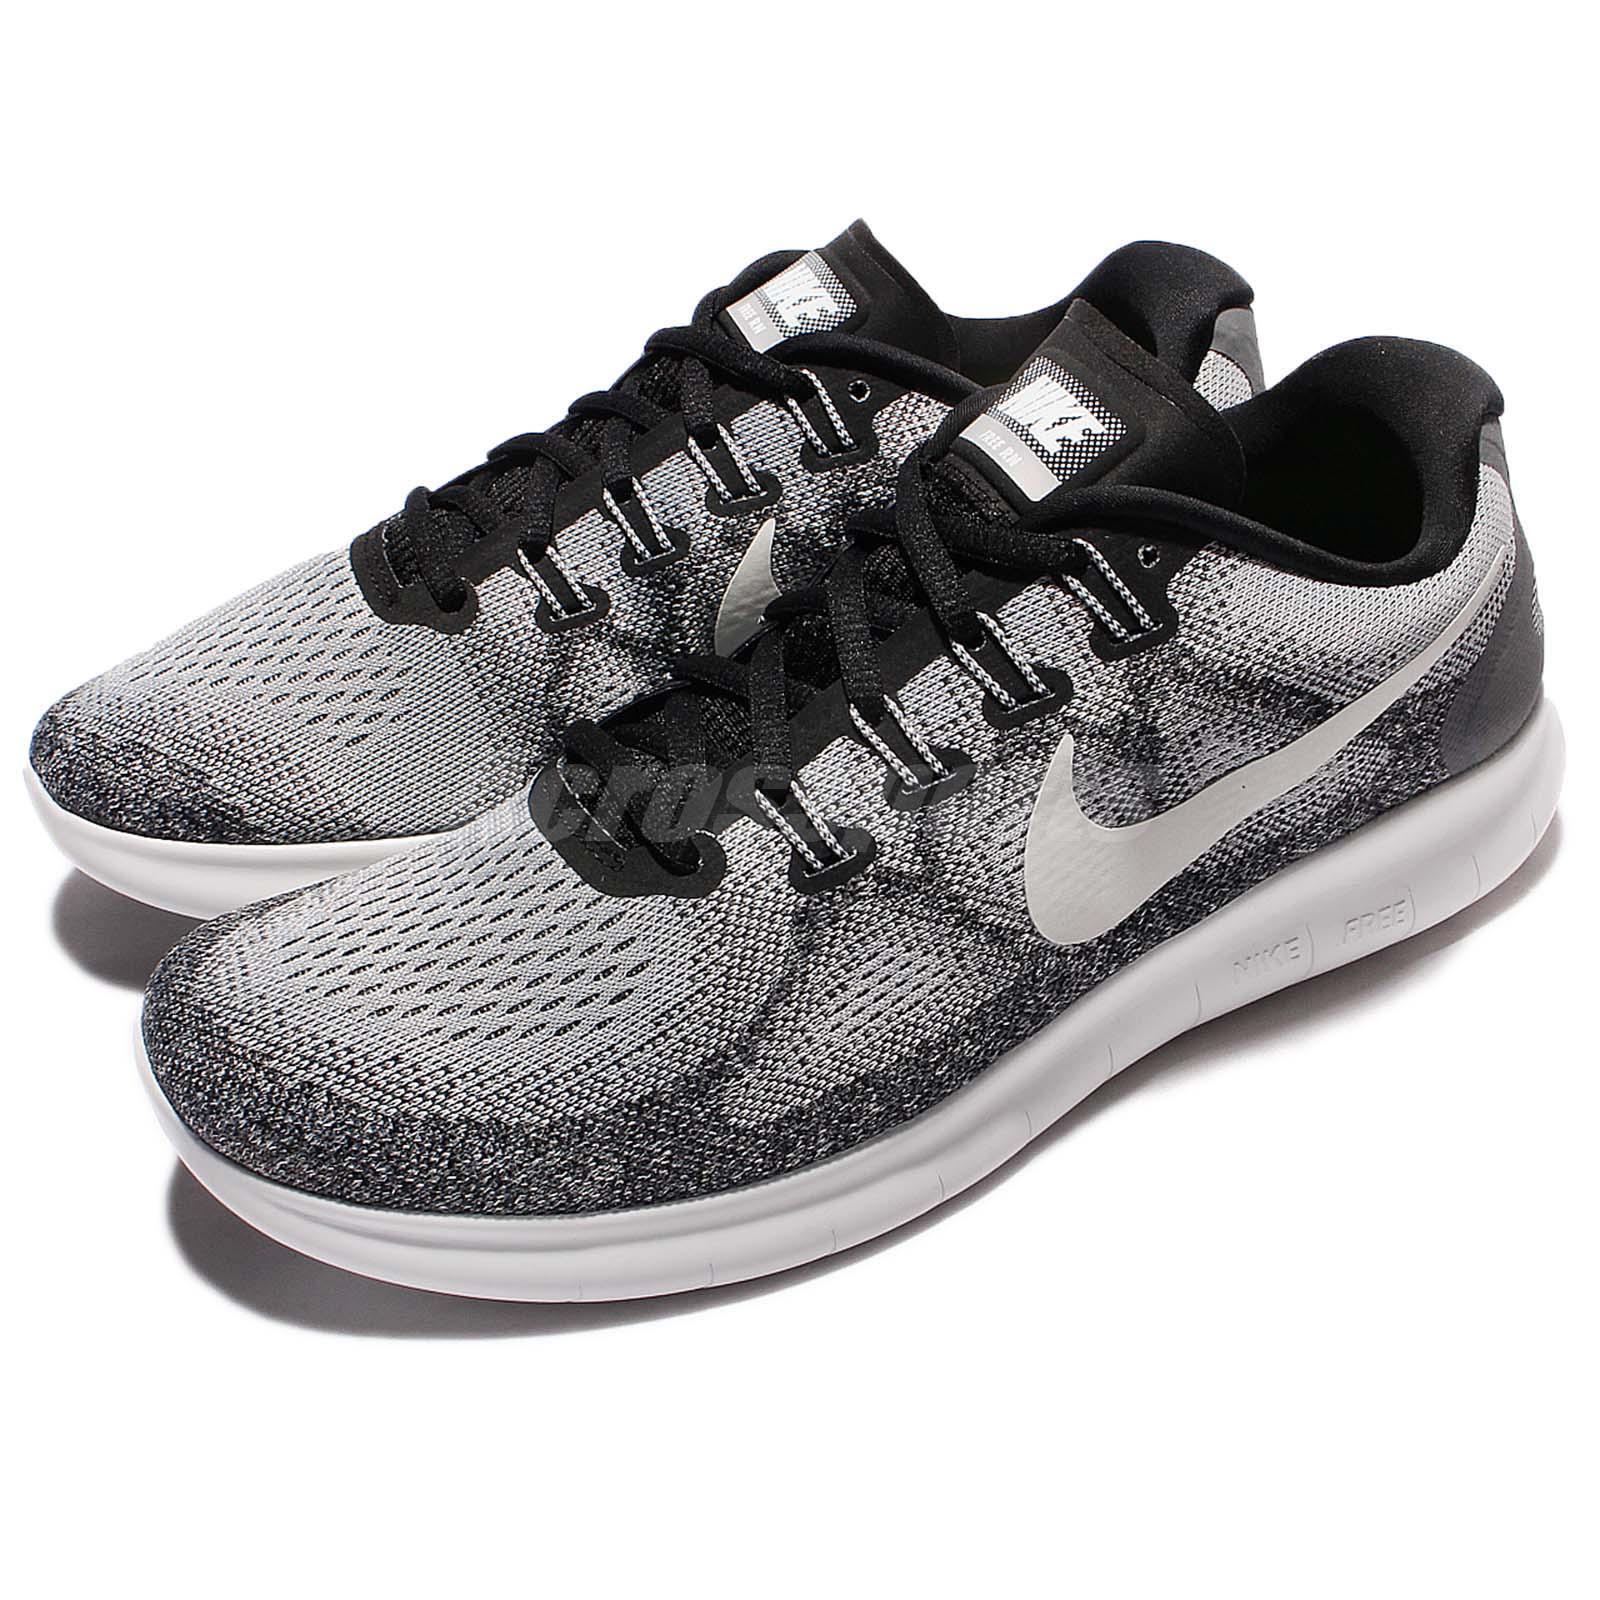 Nike Nike Nike Free RN 2017 Run grigio bianca Uomo Running scarpe scarpe da ginnastica Trainers 880839-002 04cb70